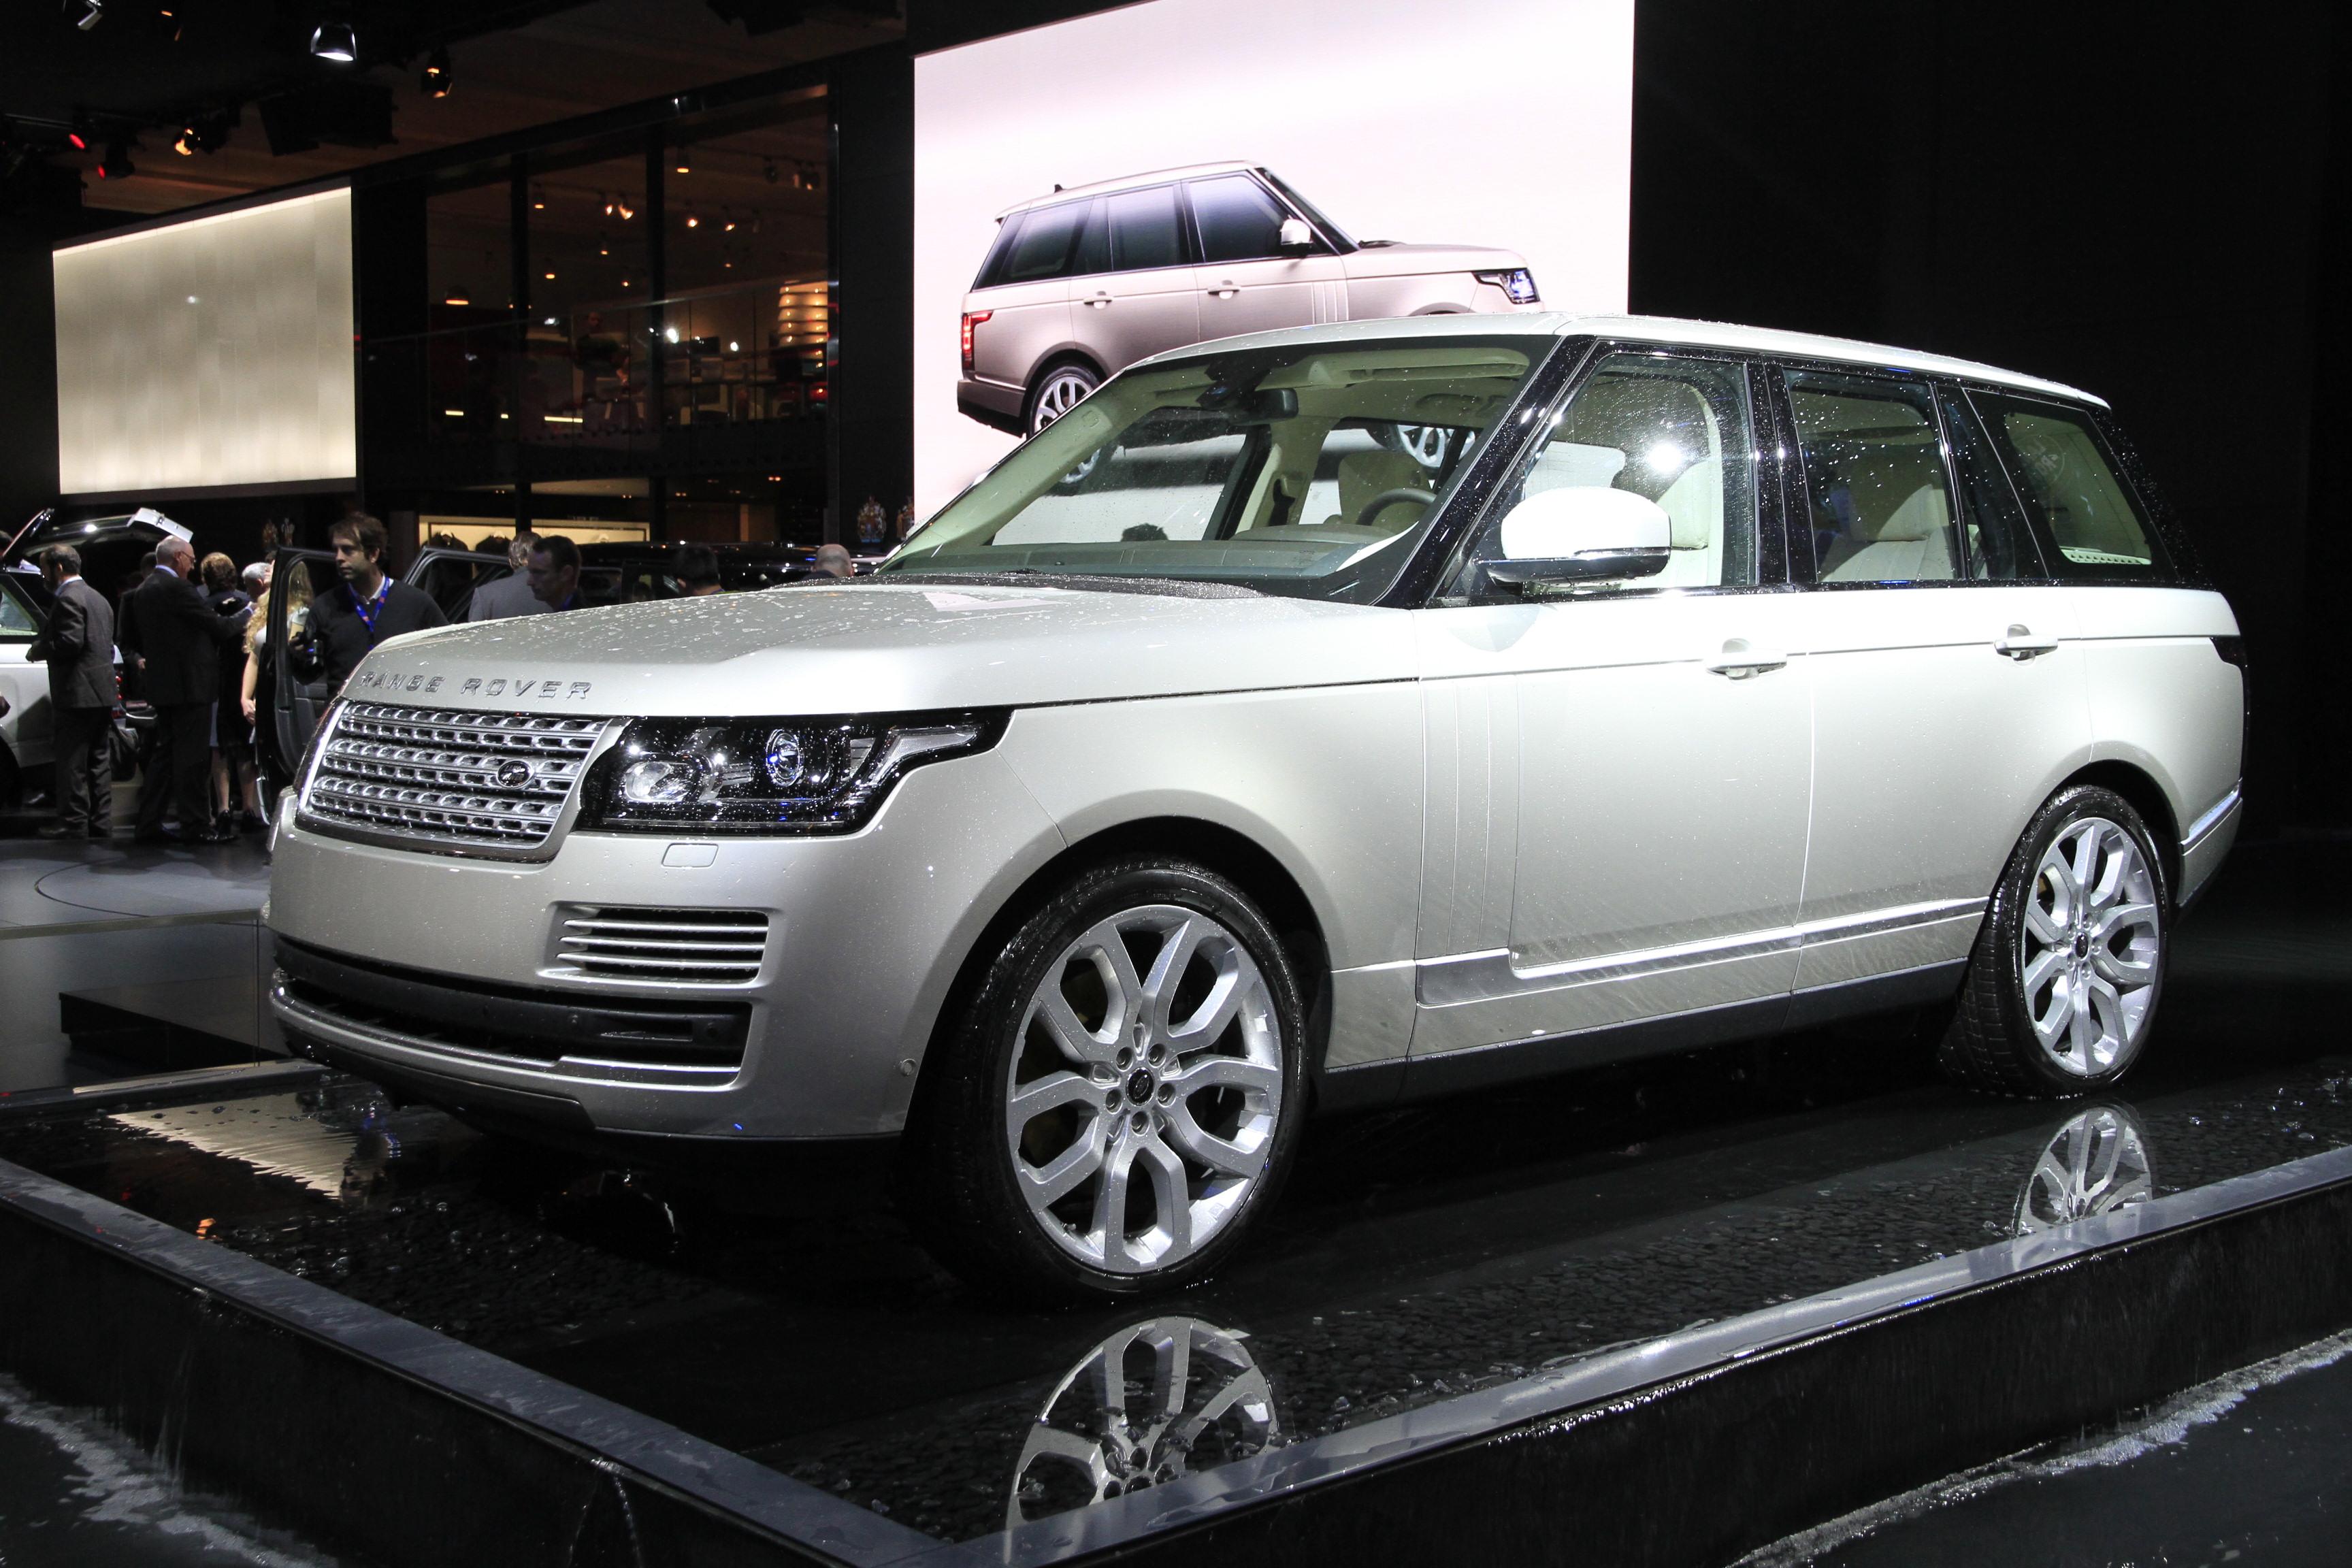 http://images.caradisiac.com/images/1/3/9/0/81390/S0-En-direct-du-Mondial-2012-Land-Rover-Range-Rover-273242.jpg